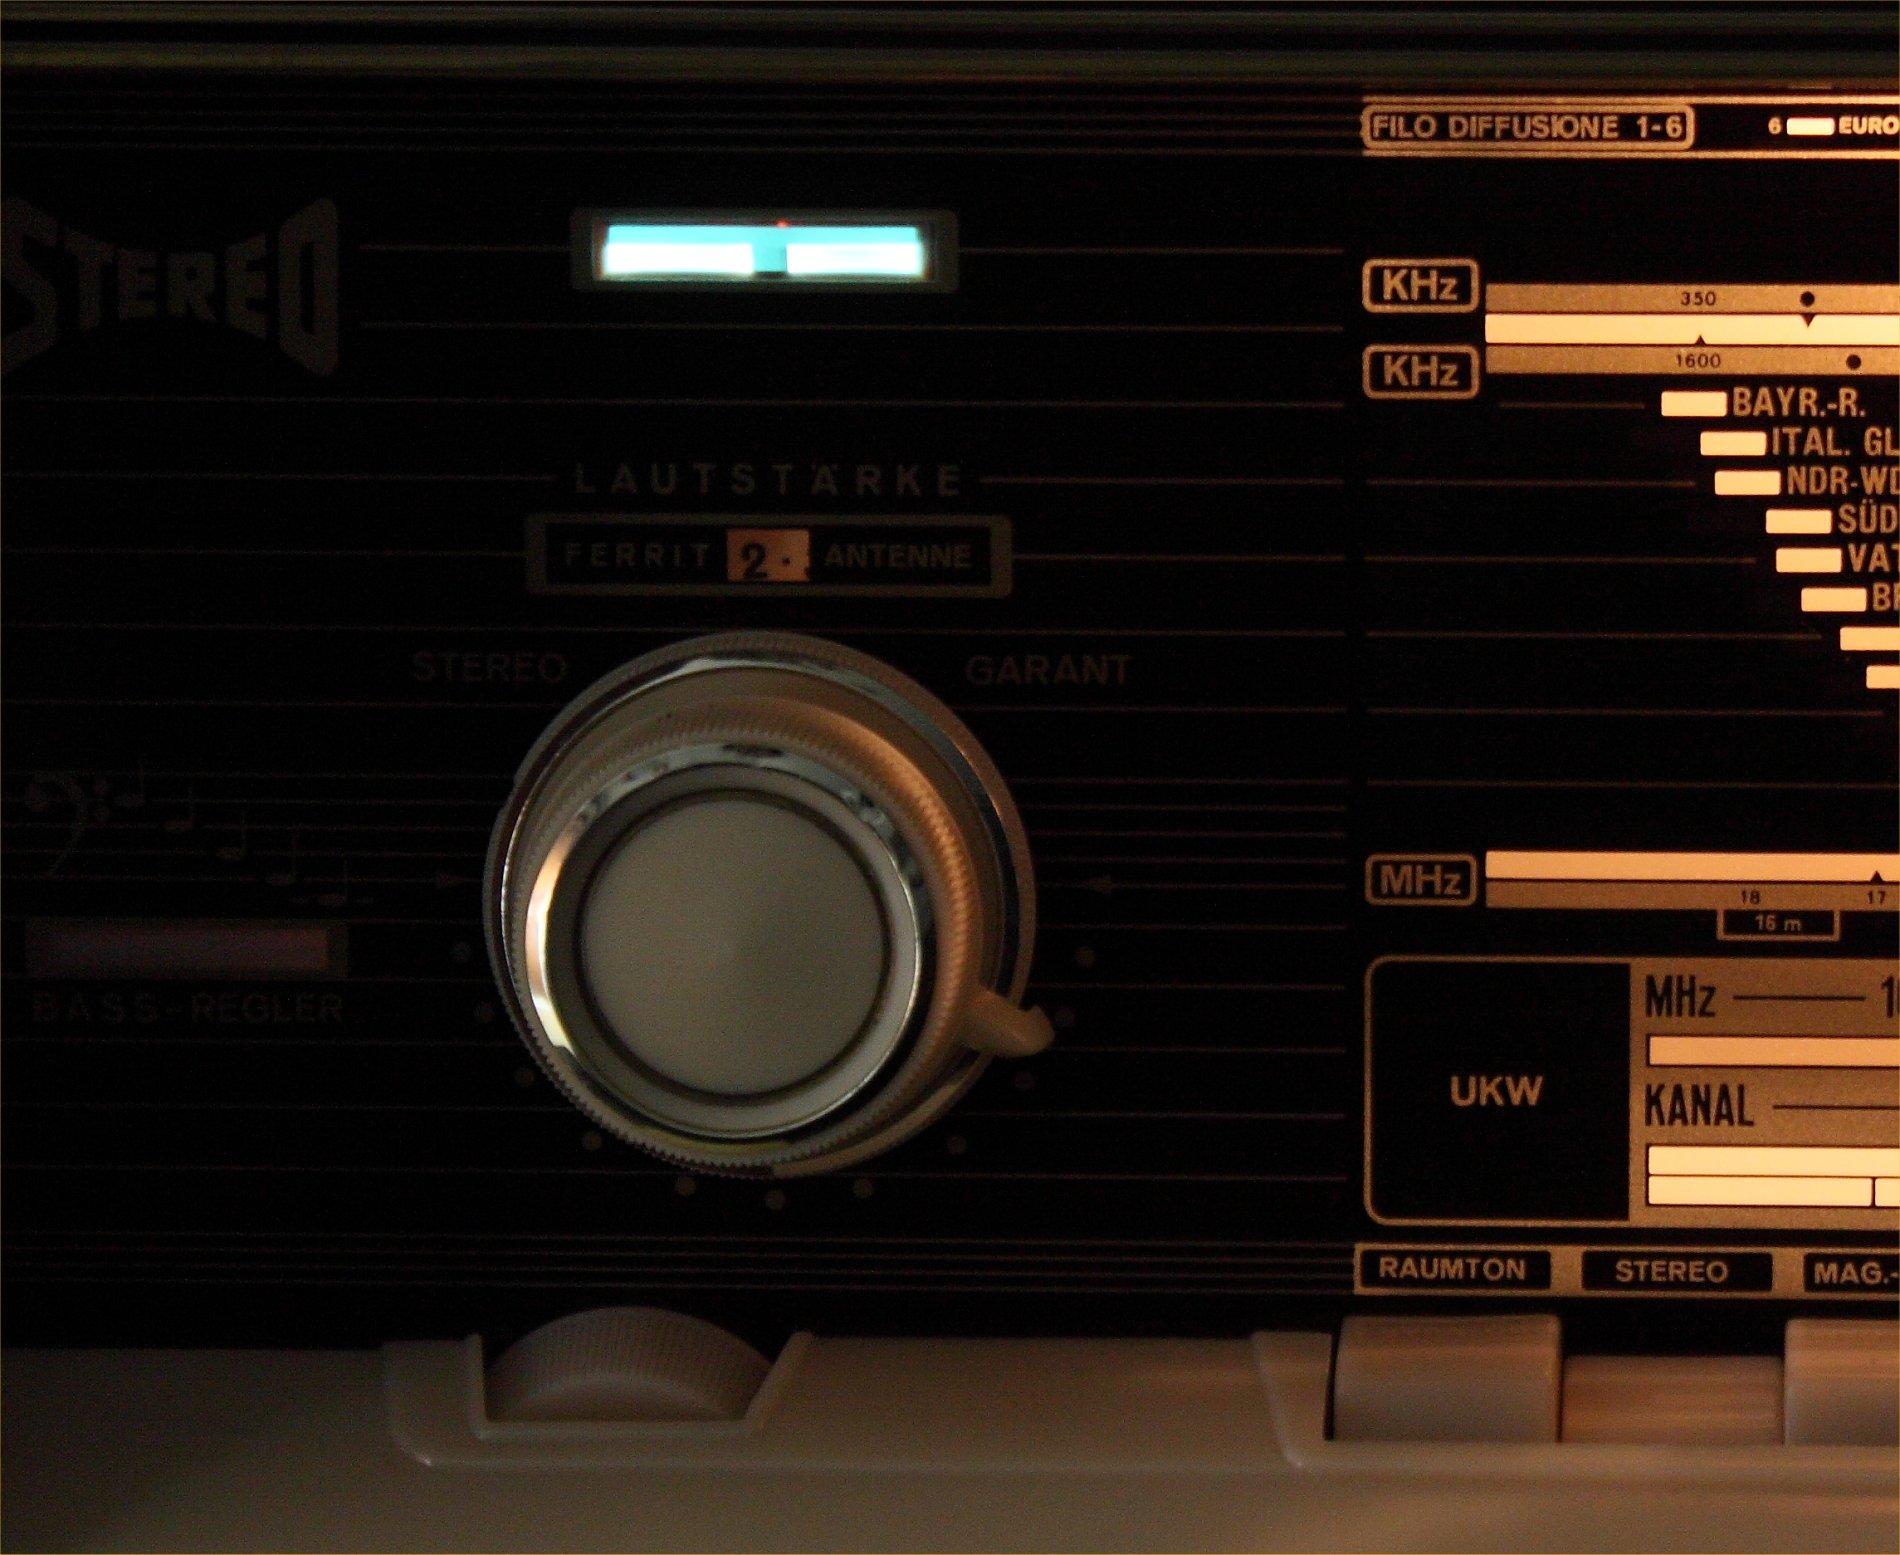 Graetz Fantasia 922 Luxus  Stereosuper